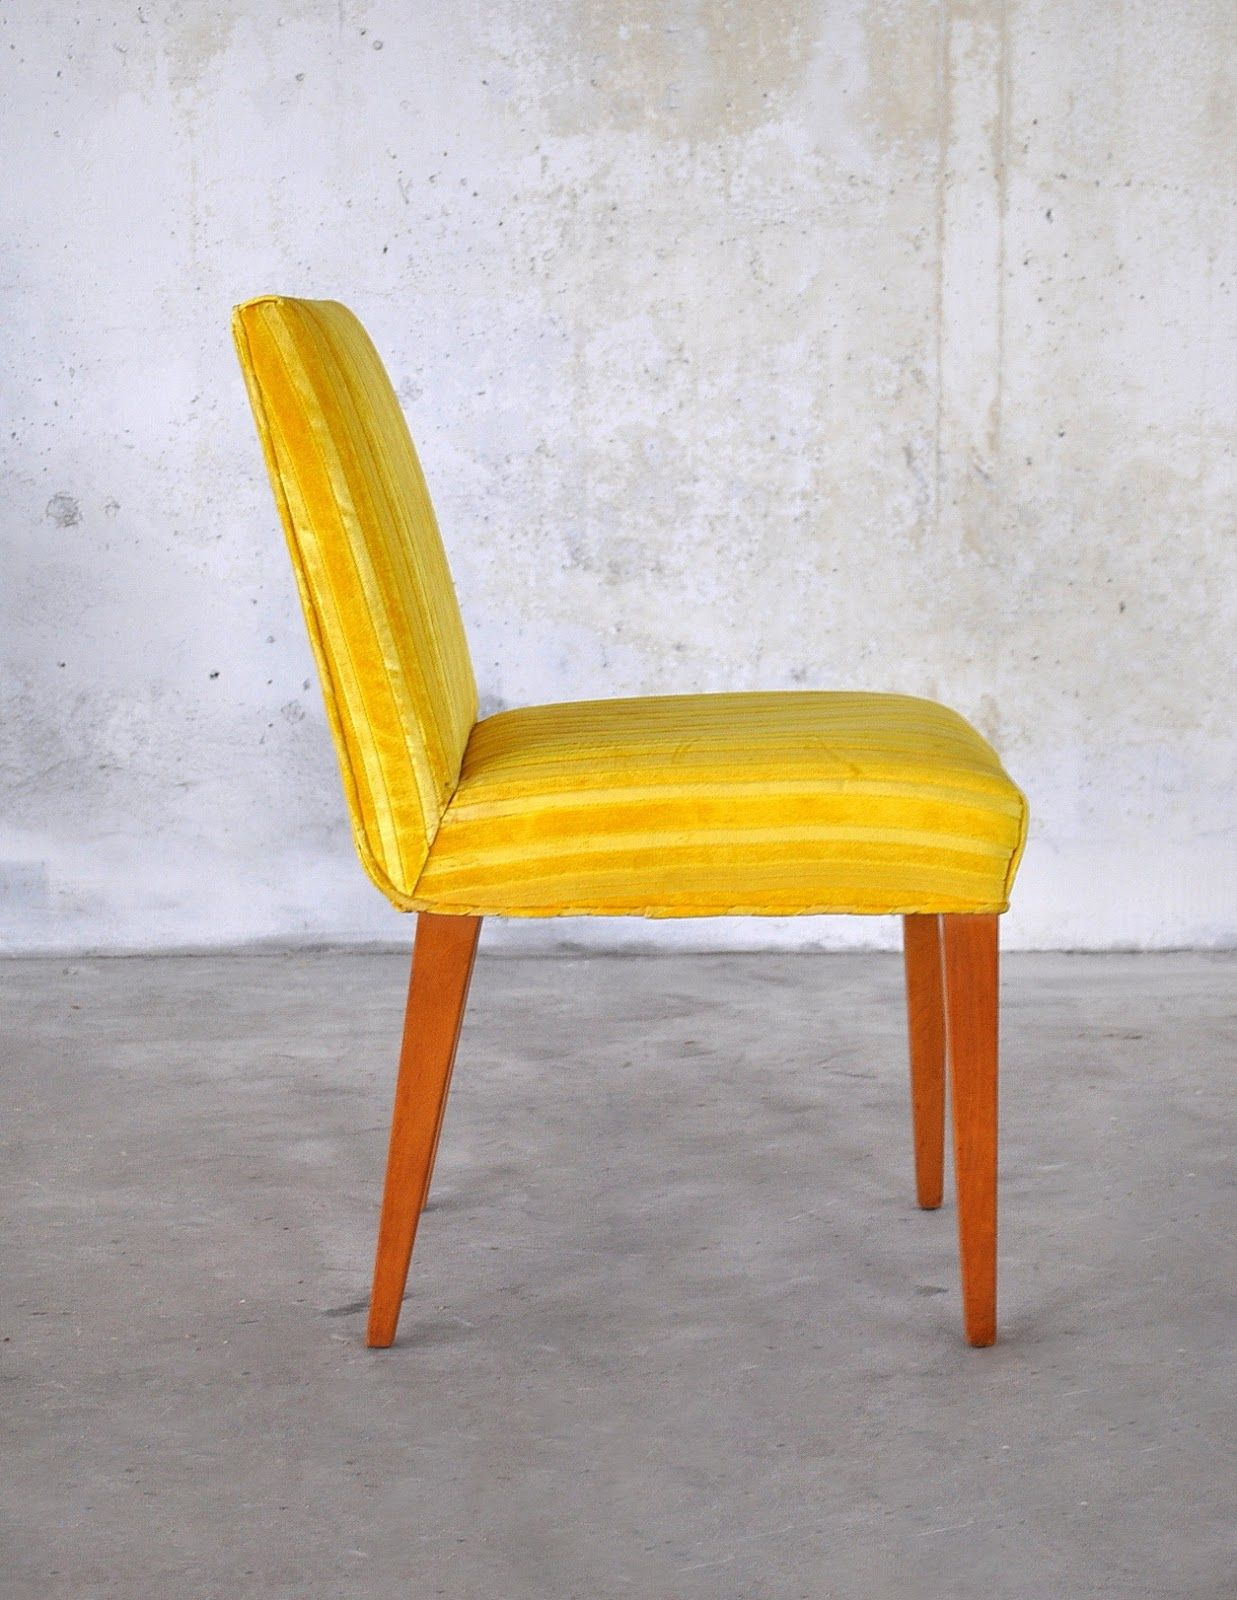 Yellow leather kitchen chairs sodakaustica pinterest